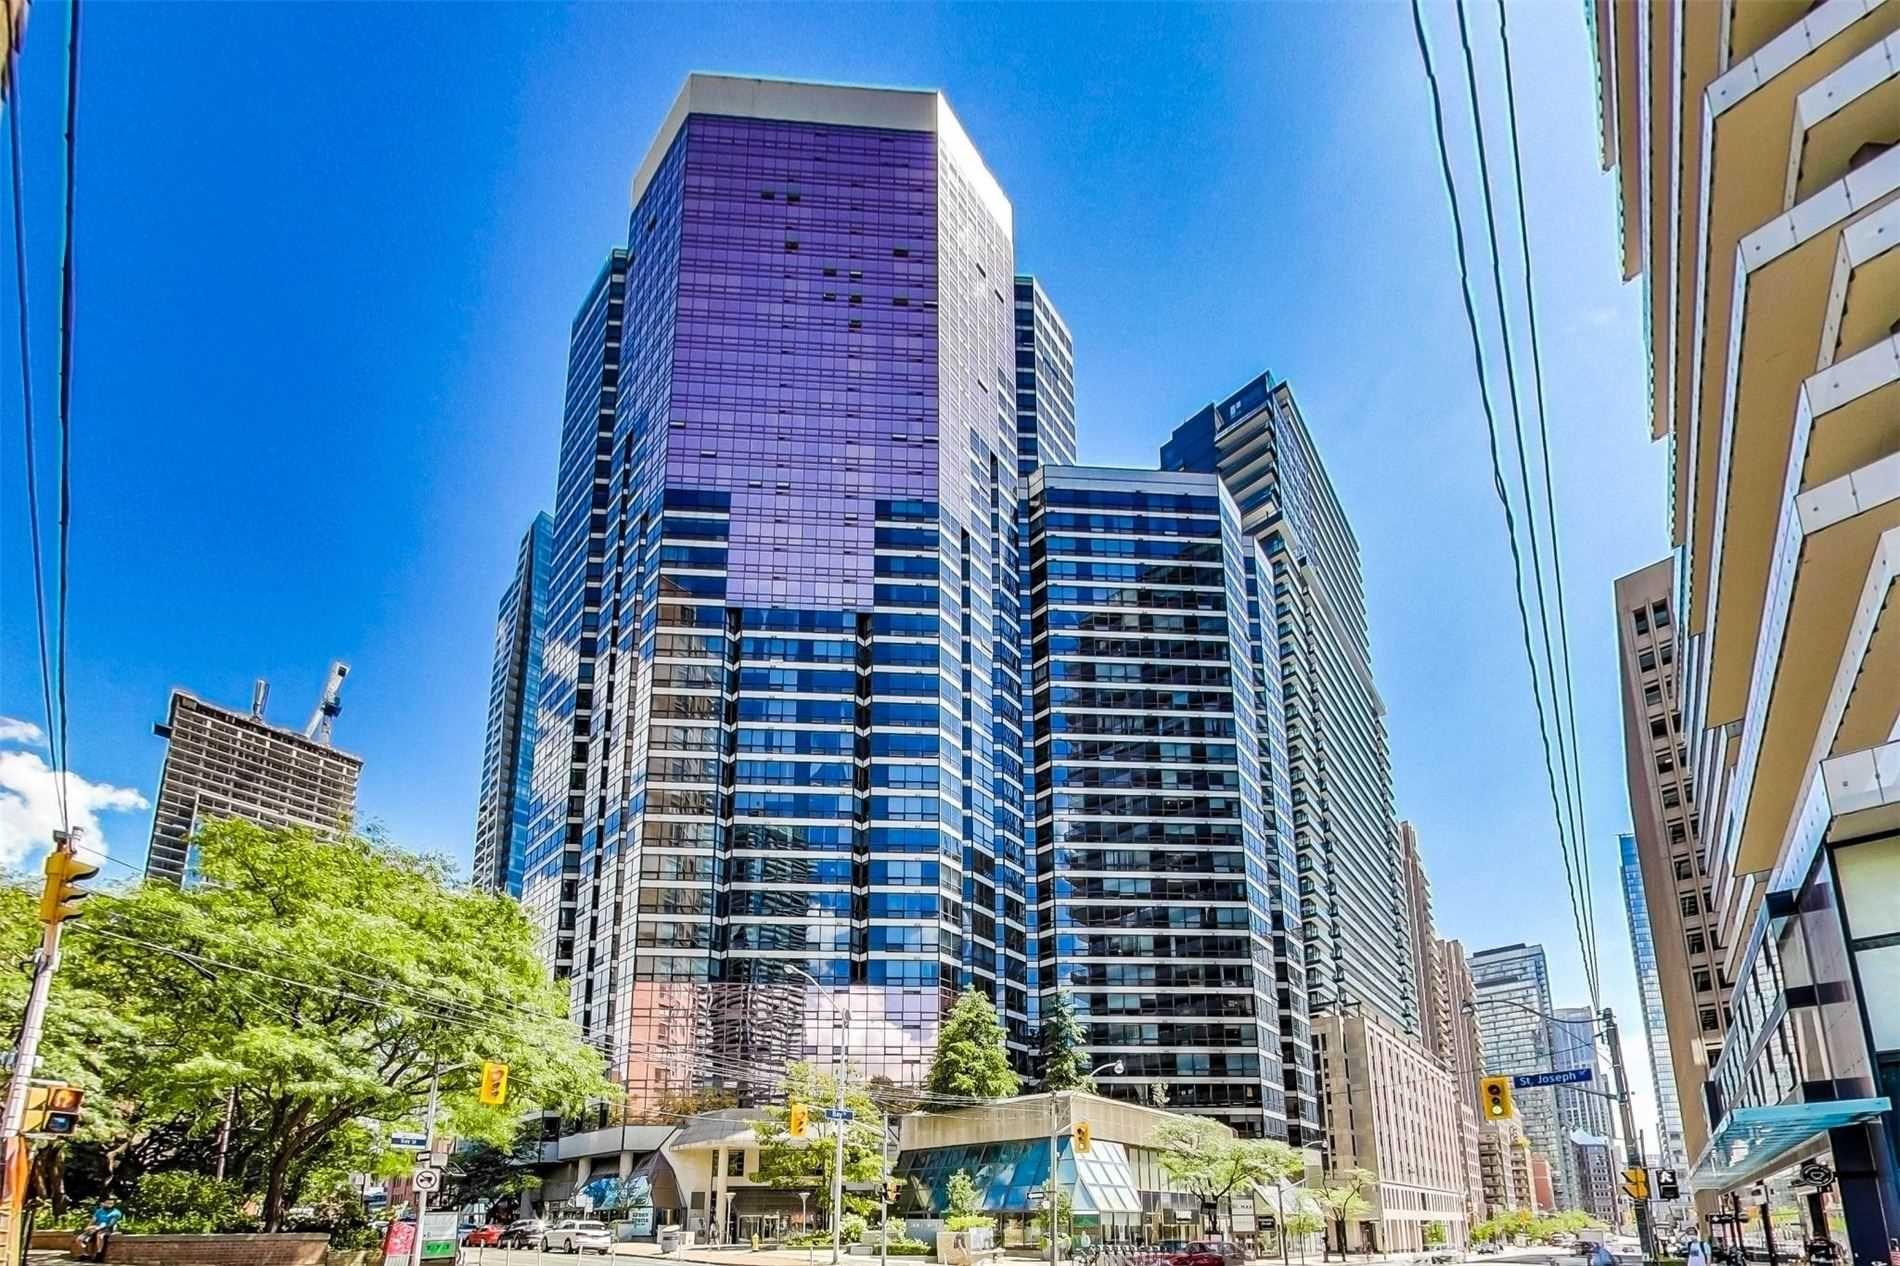 Main Photo: 314 1001 Bay Street in Toronto: Bay Street Corridor Condo for sale (Toronto C01)  : MLS®# C4918474